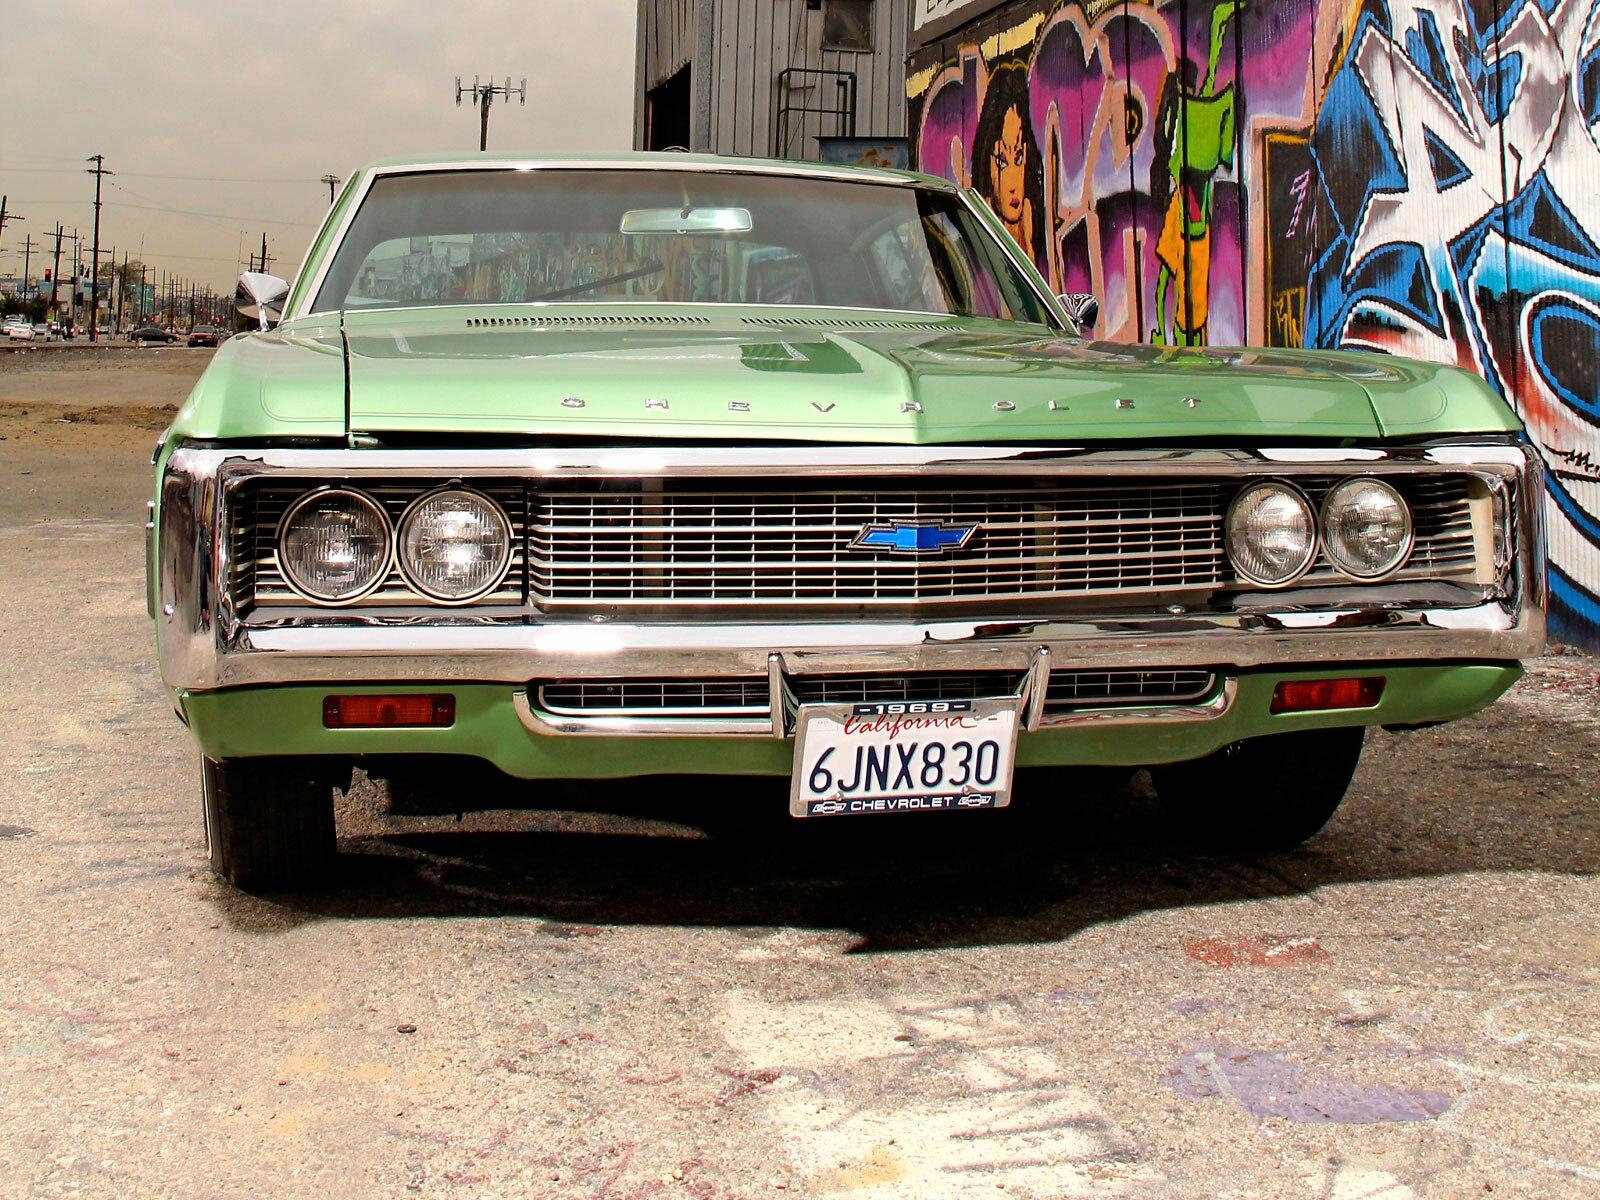 1207-lrmp-09-hp-1969-chevrolet-caprice-front-fascia